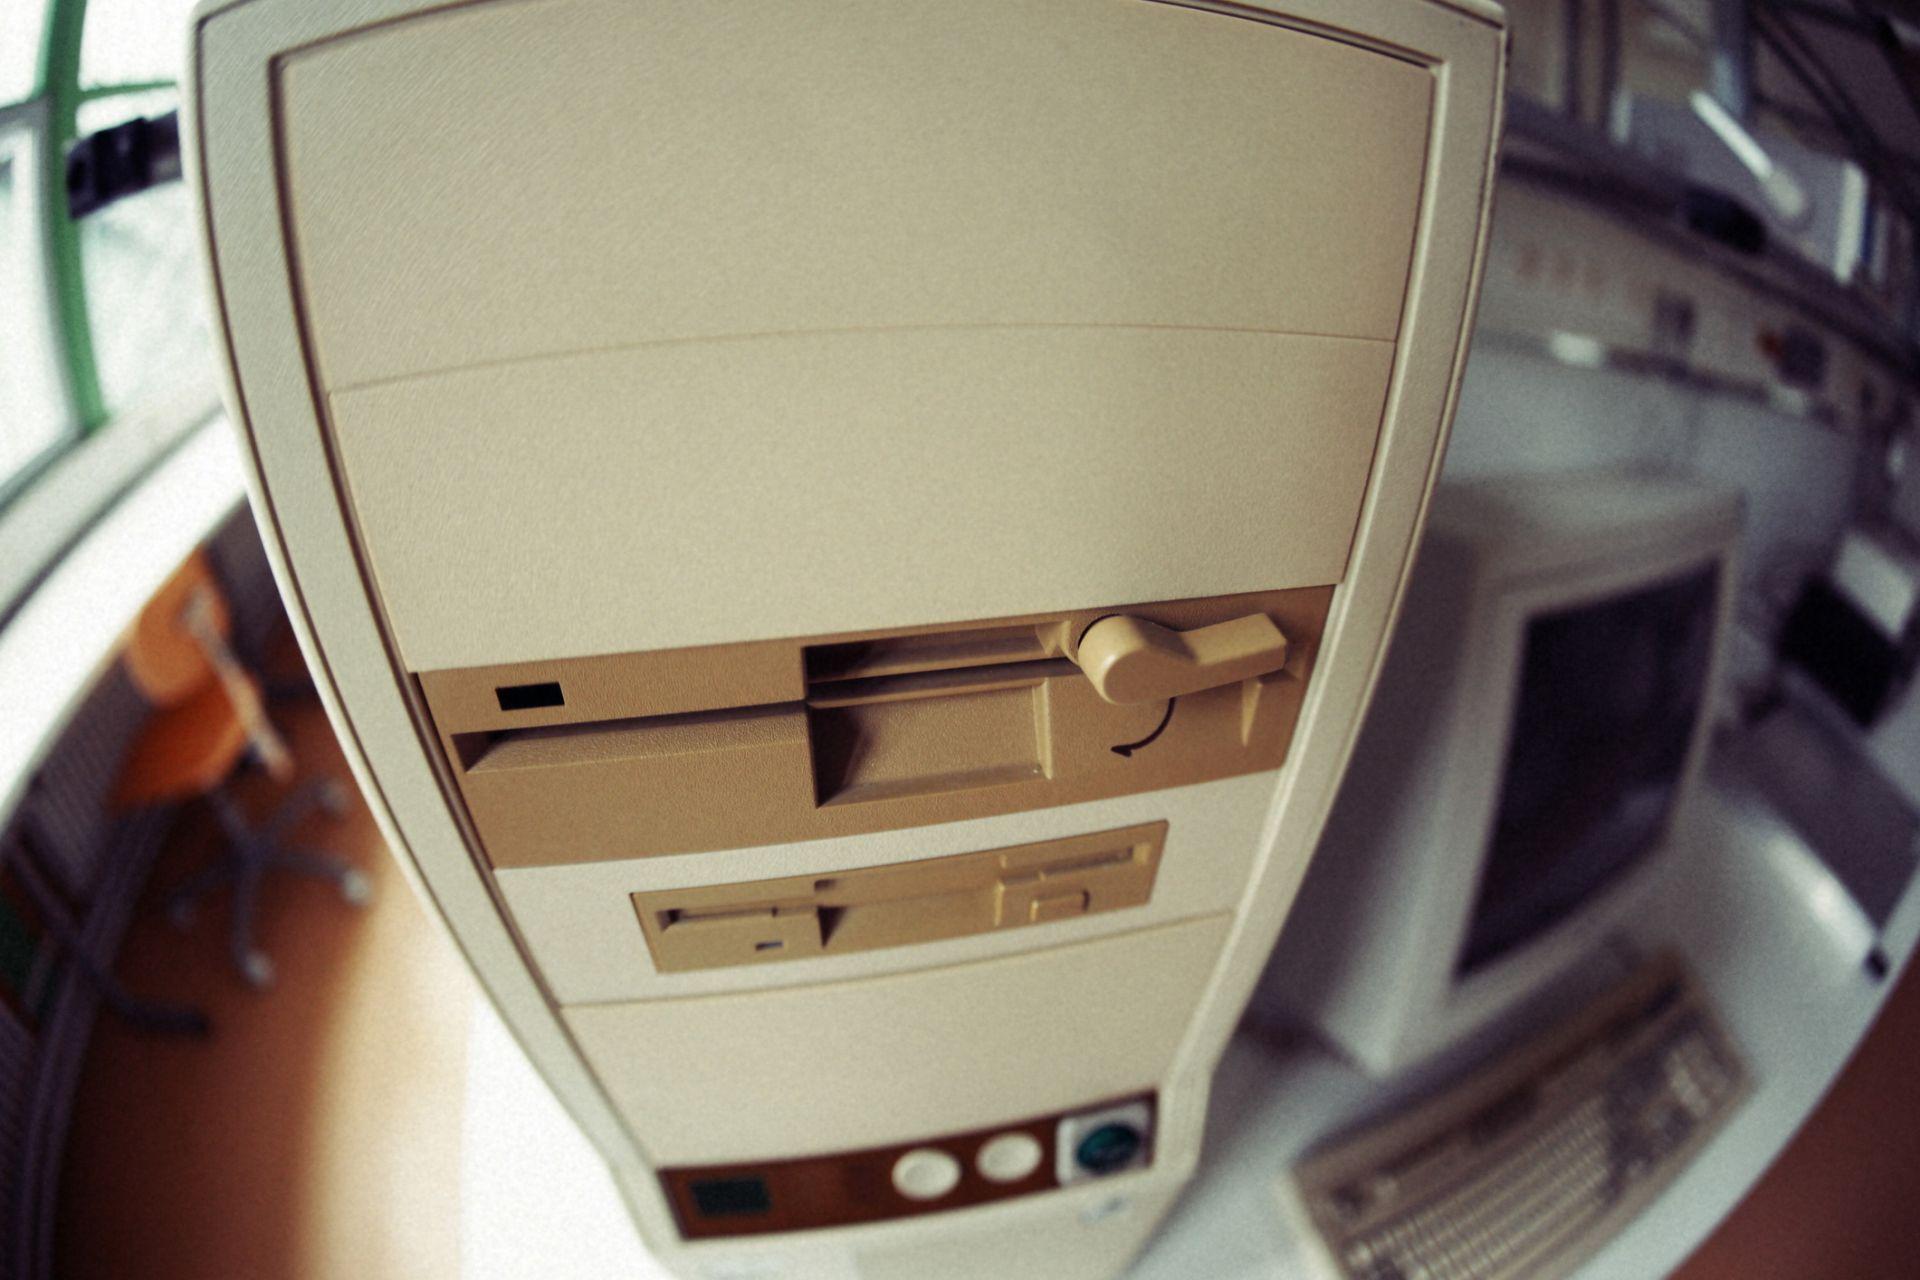 PC con Botón Turbo (imagen de Thanawat Thiasiriphet).